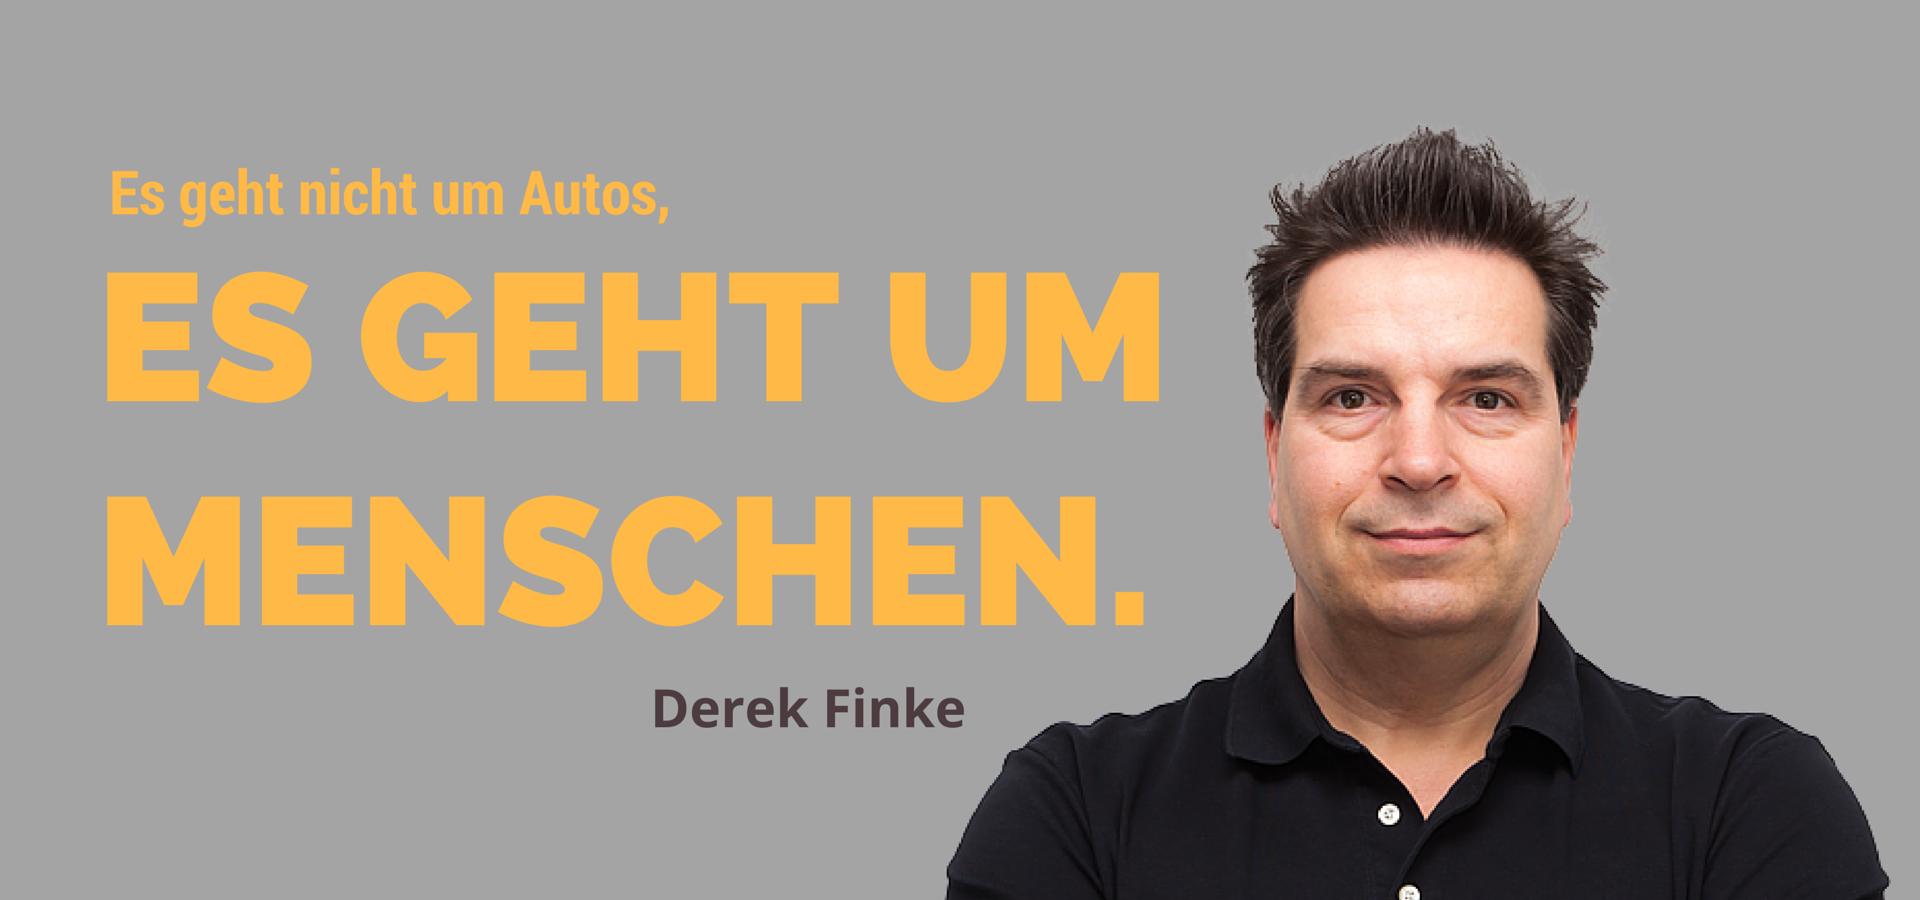 Derek FInke